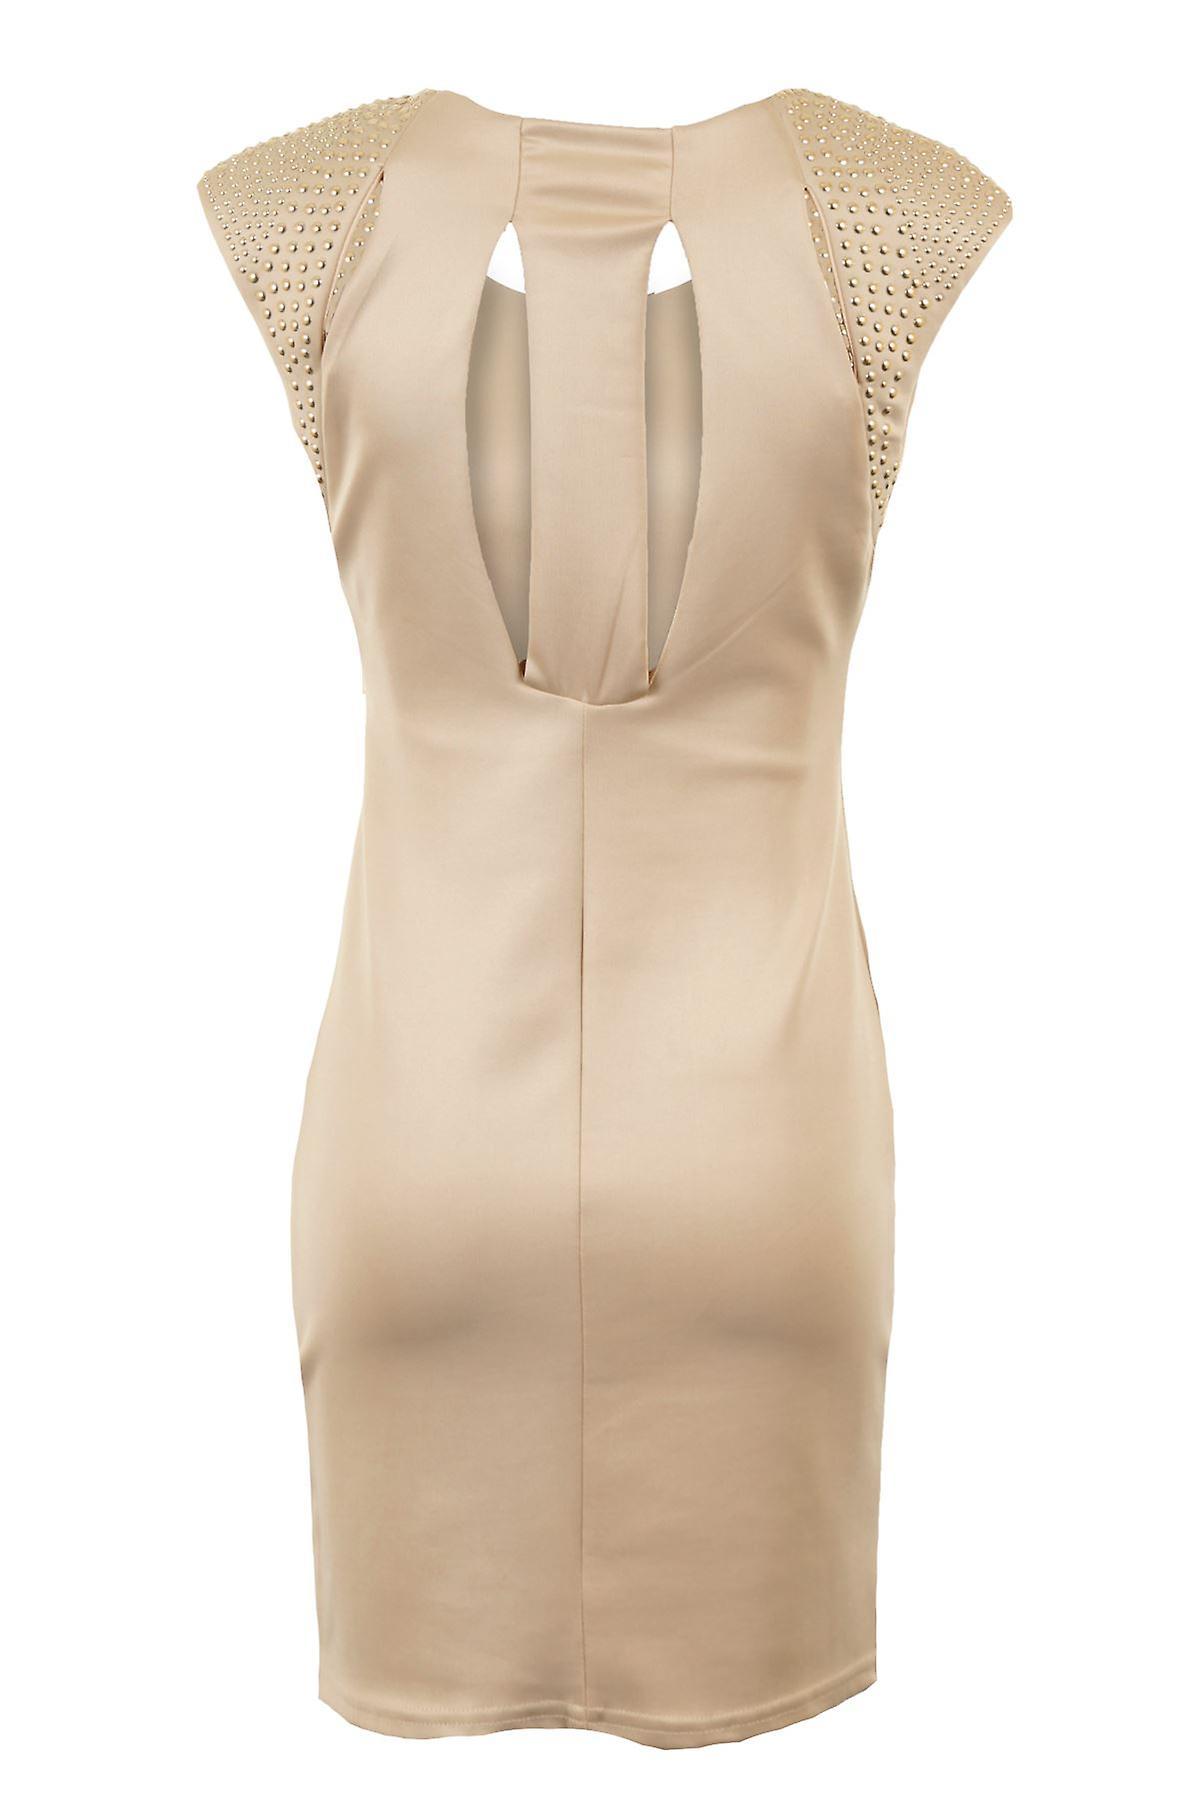 Ladies Gold Studded Padded Shoulder Black Stone Stretch Bodycon Womens Dress